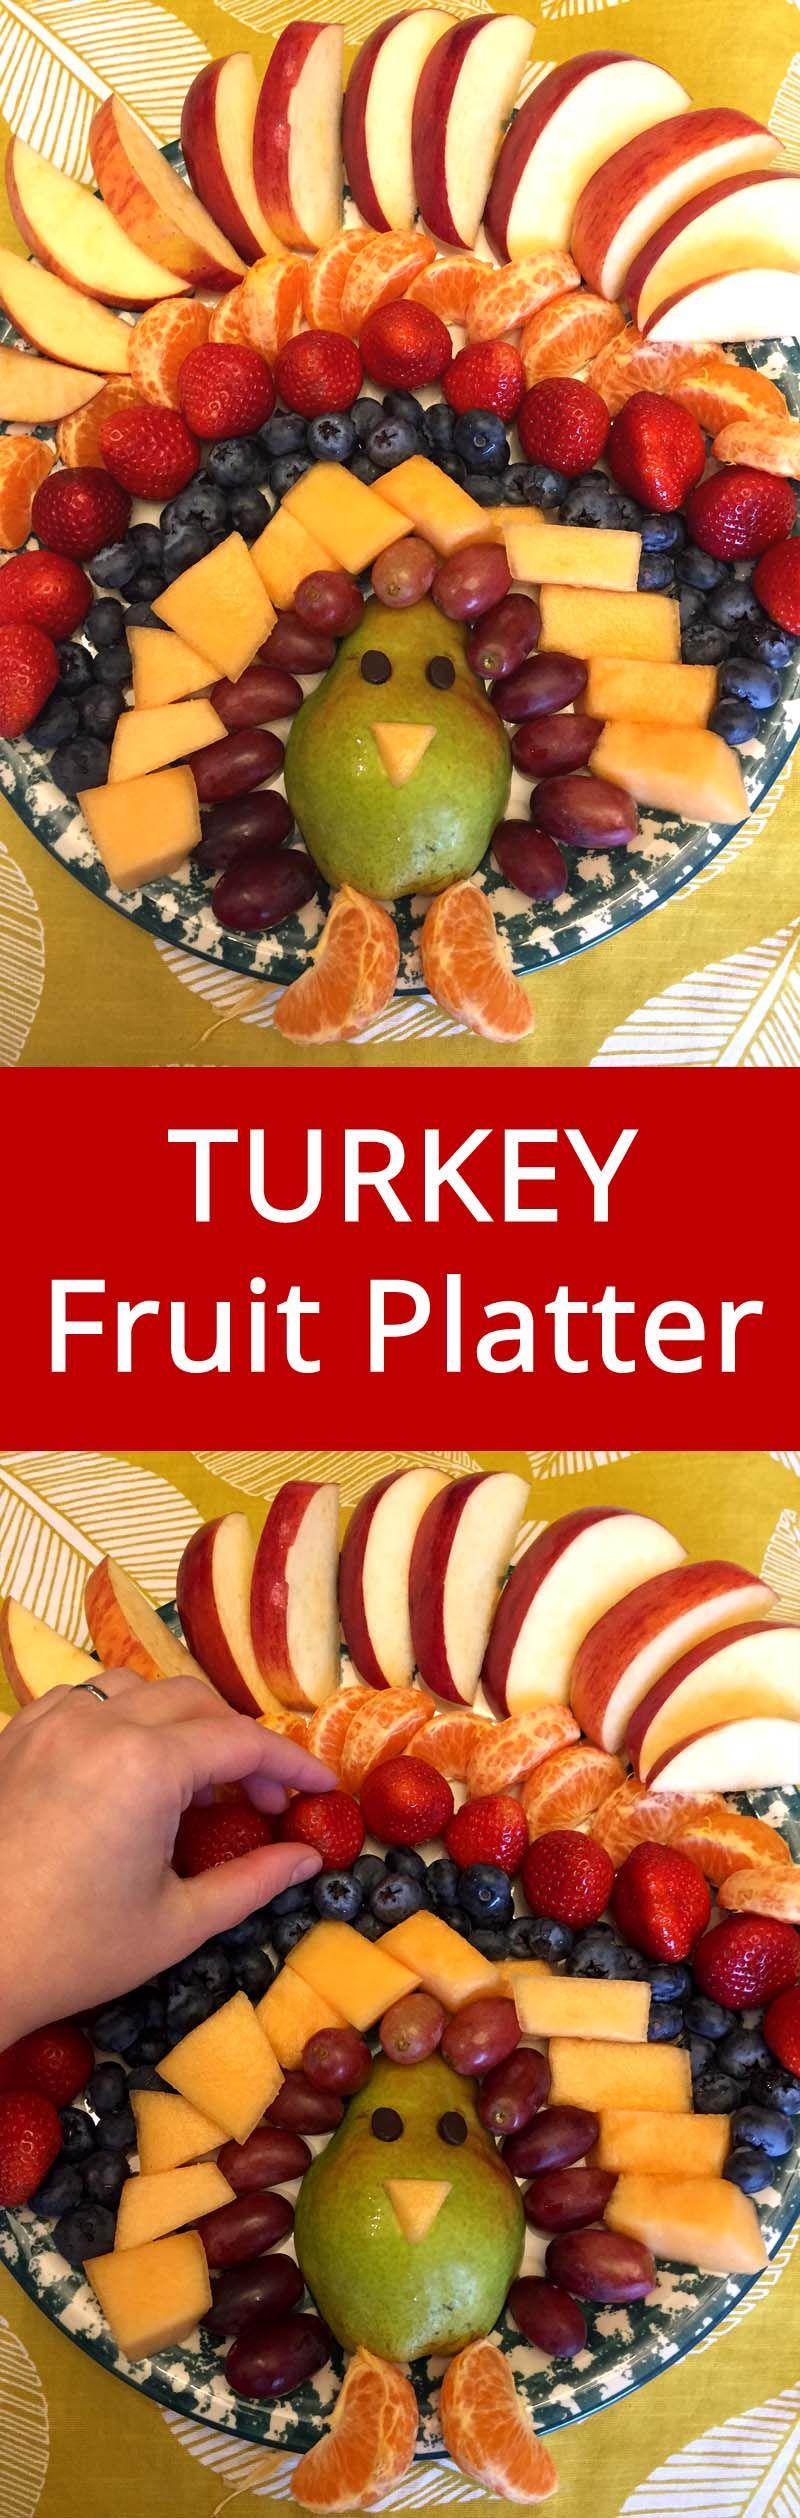 Thanksgiving Turkey-Shaped Fruit Platter Appetizer #thanksgivingrecipes